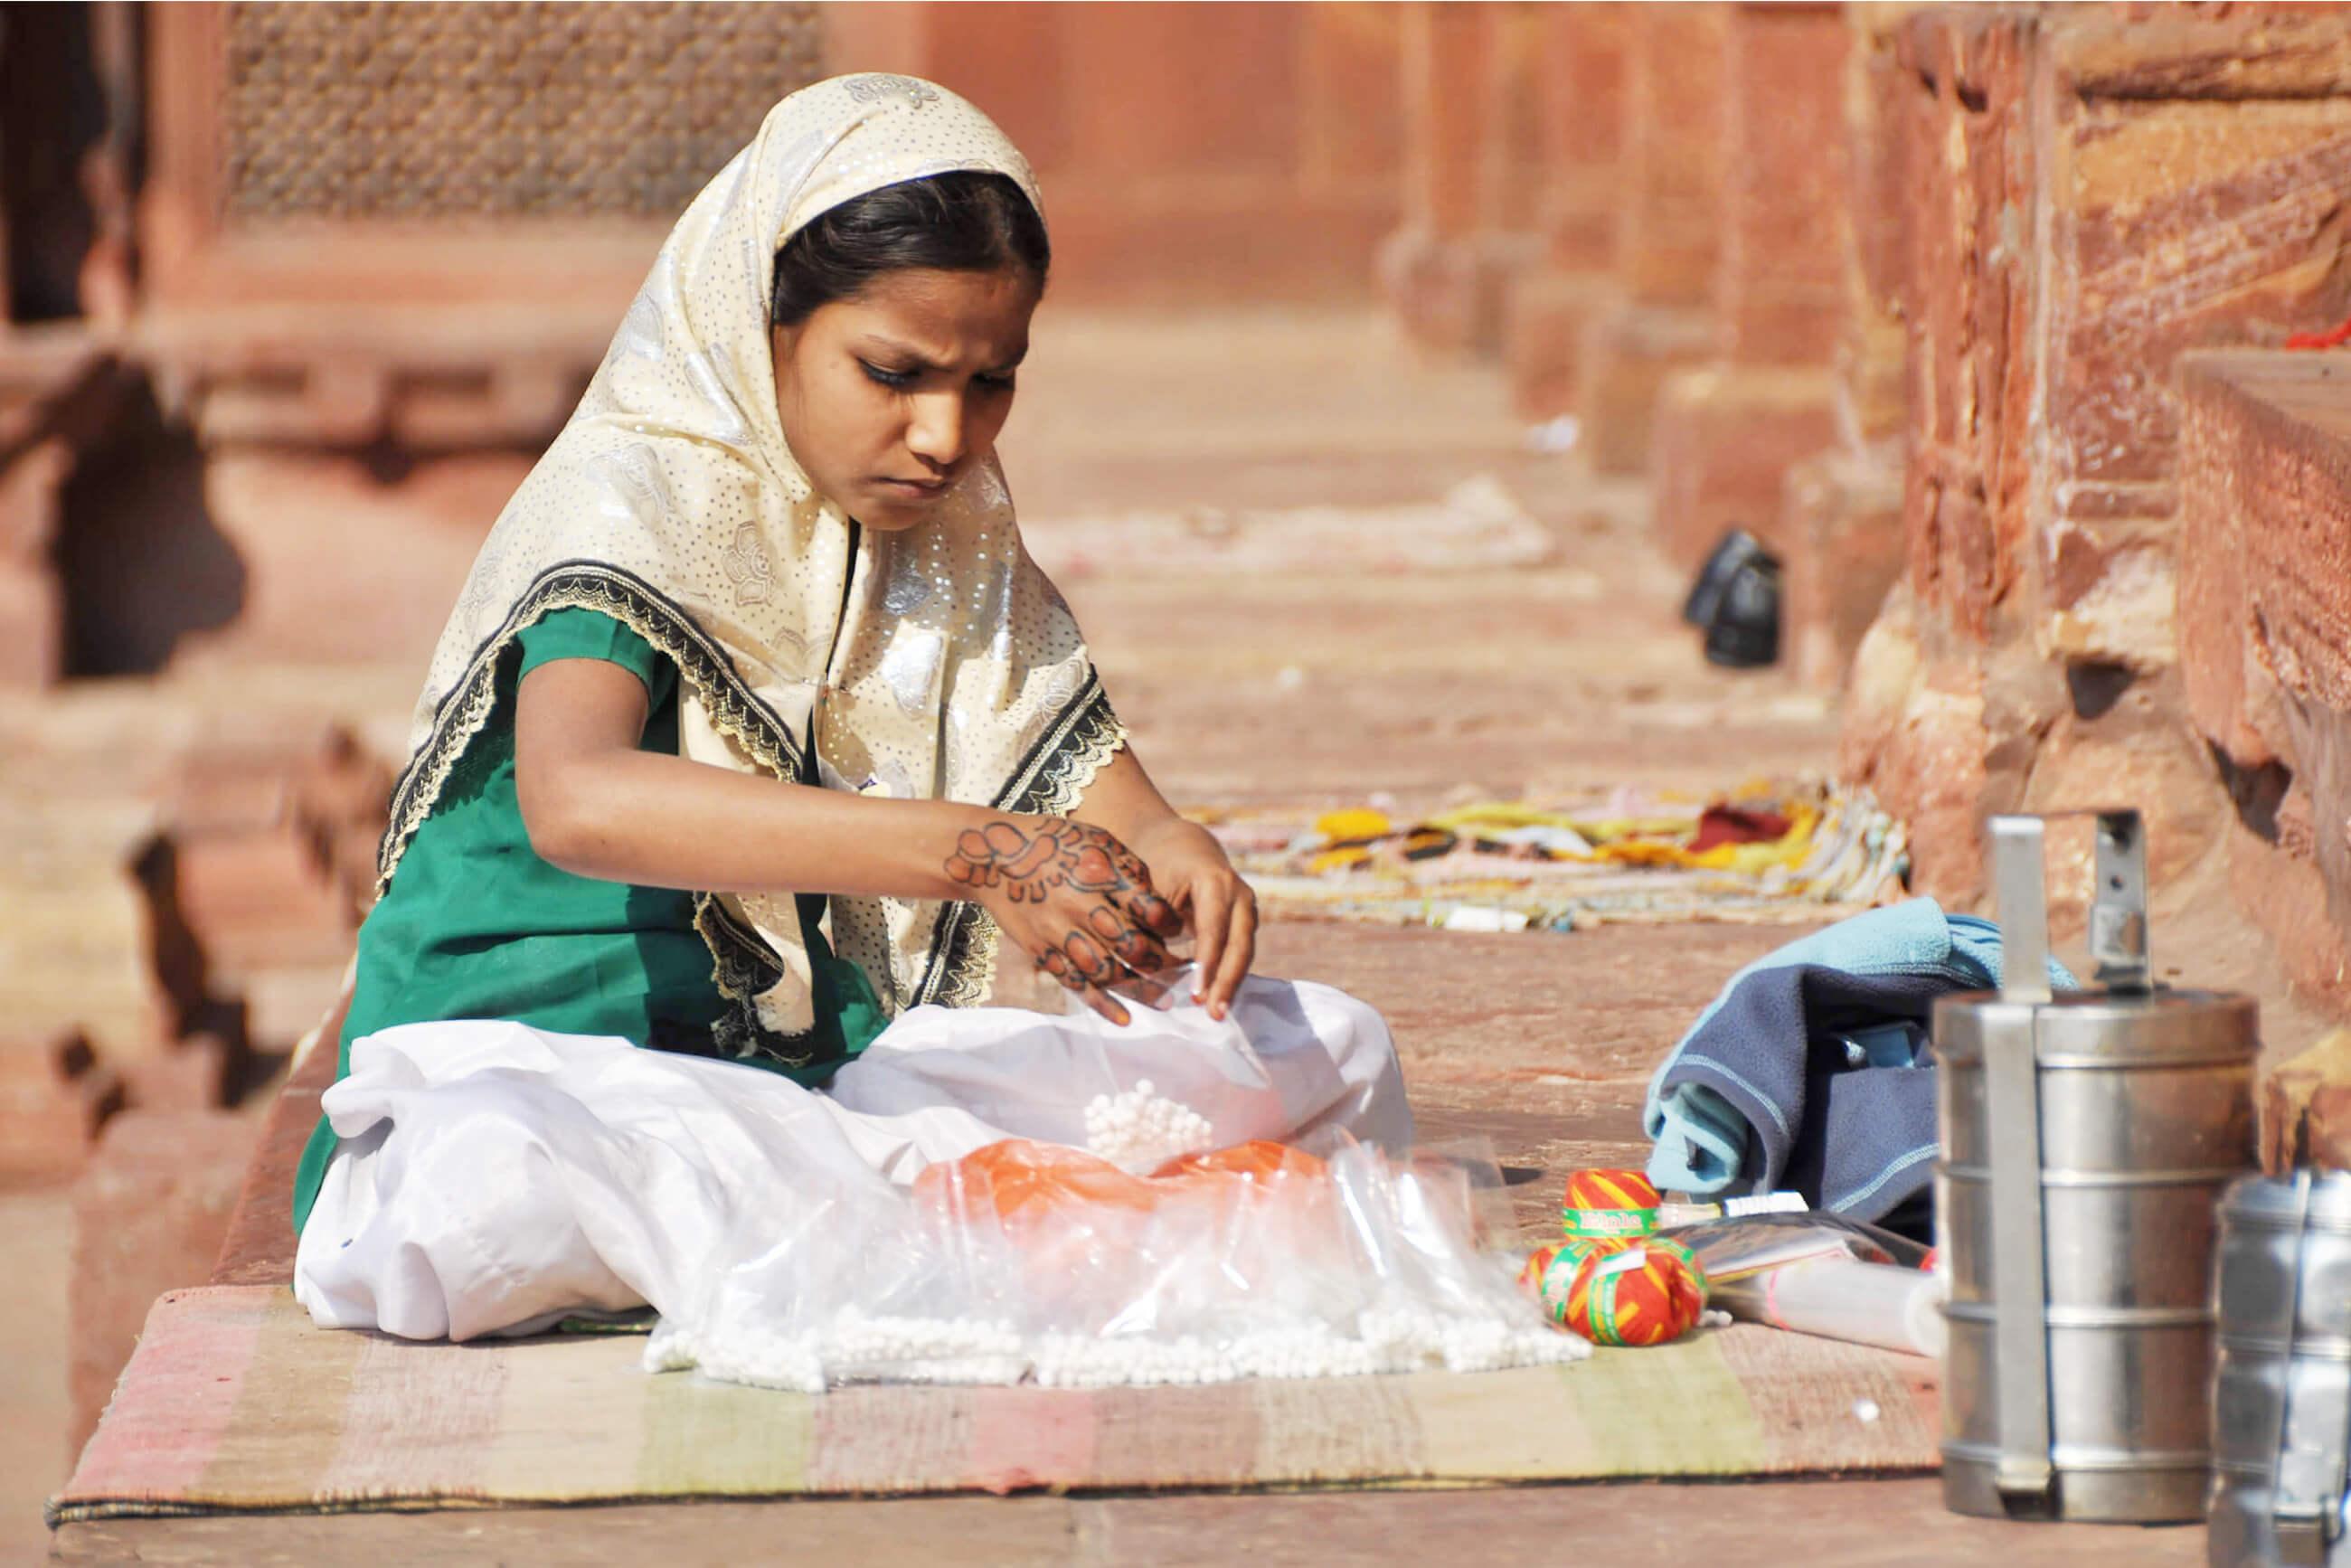 https://bubo.sk/uploads/galleries/16619/tomaskubus_india_fatehpur-sikri-3-1-.jpg